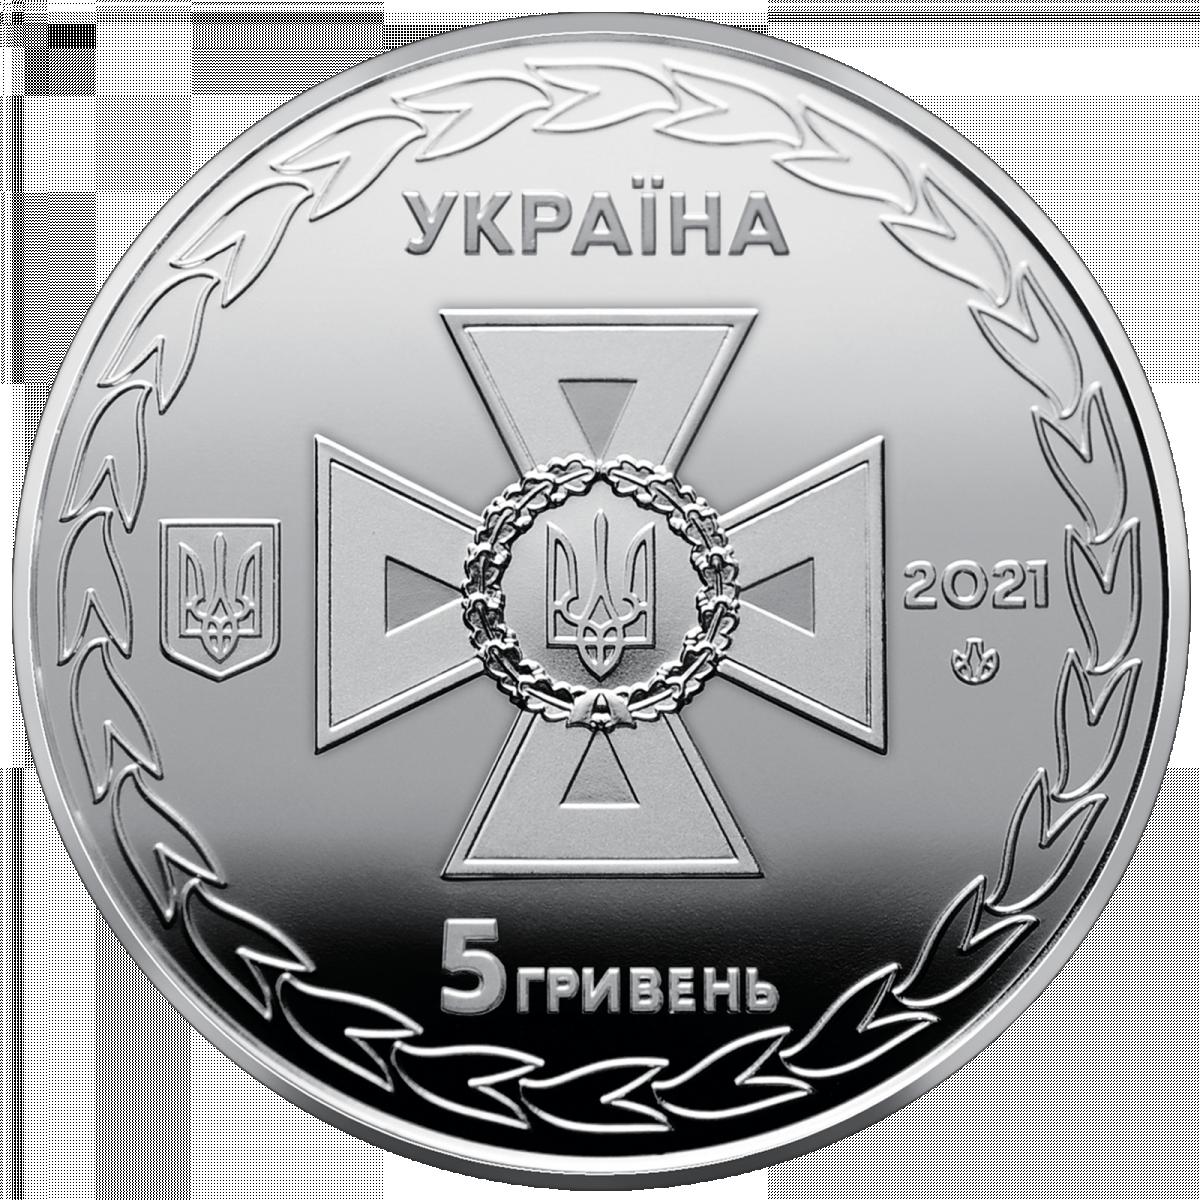 Аверс нової монети / фото прес-служба НБУ